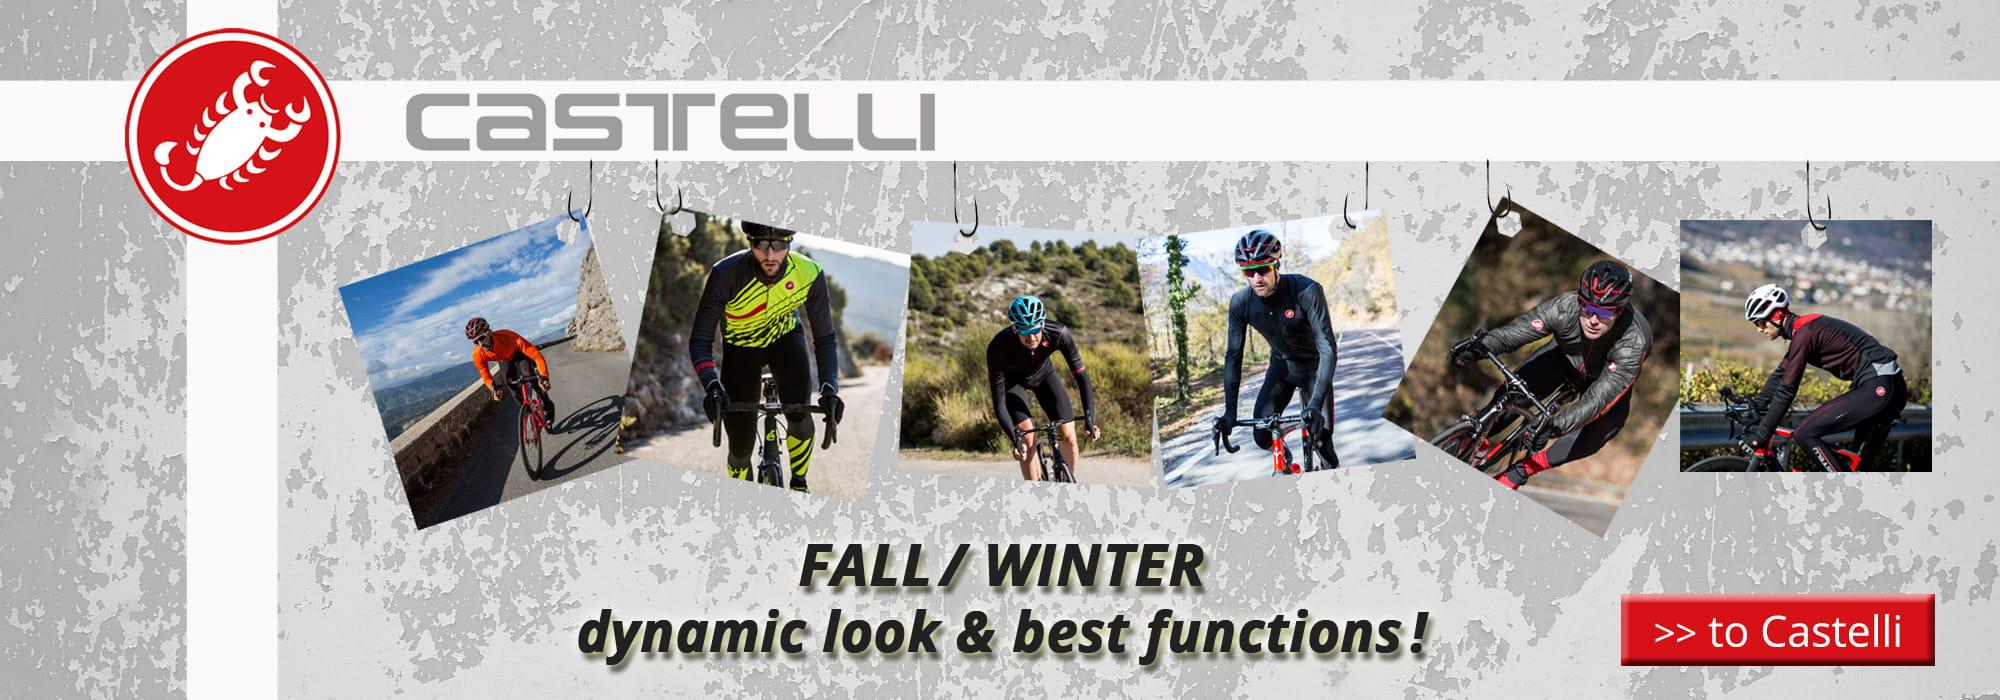 Fall/winter Castelli 2018 -  dynamic look & best functions